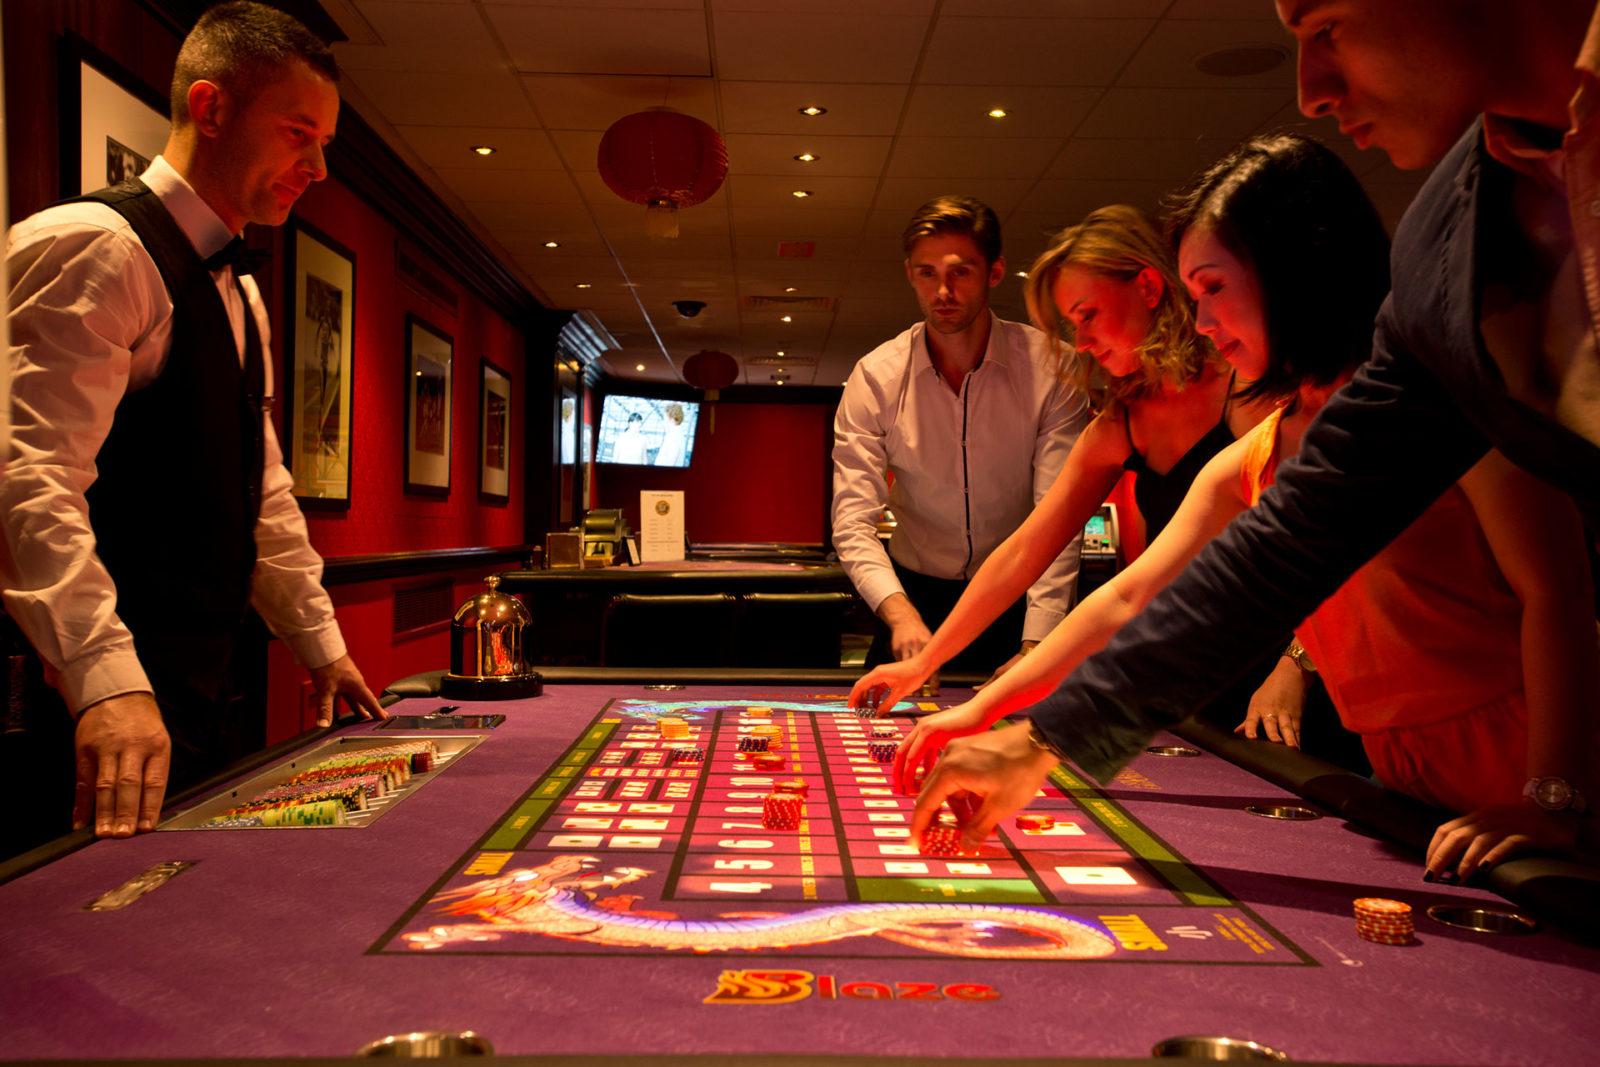 Choosing an Online Casino Should Be Taken Serious